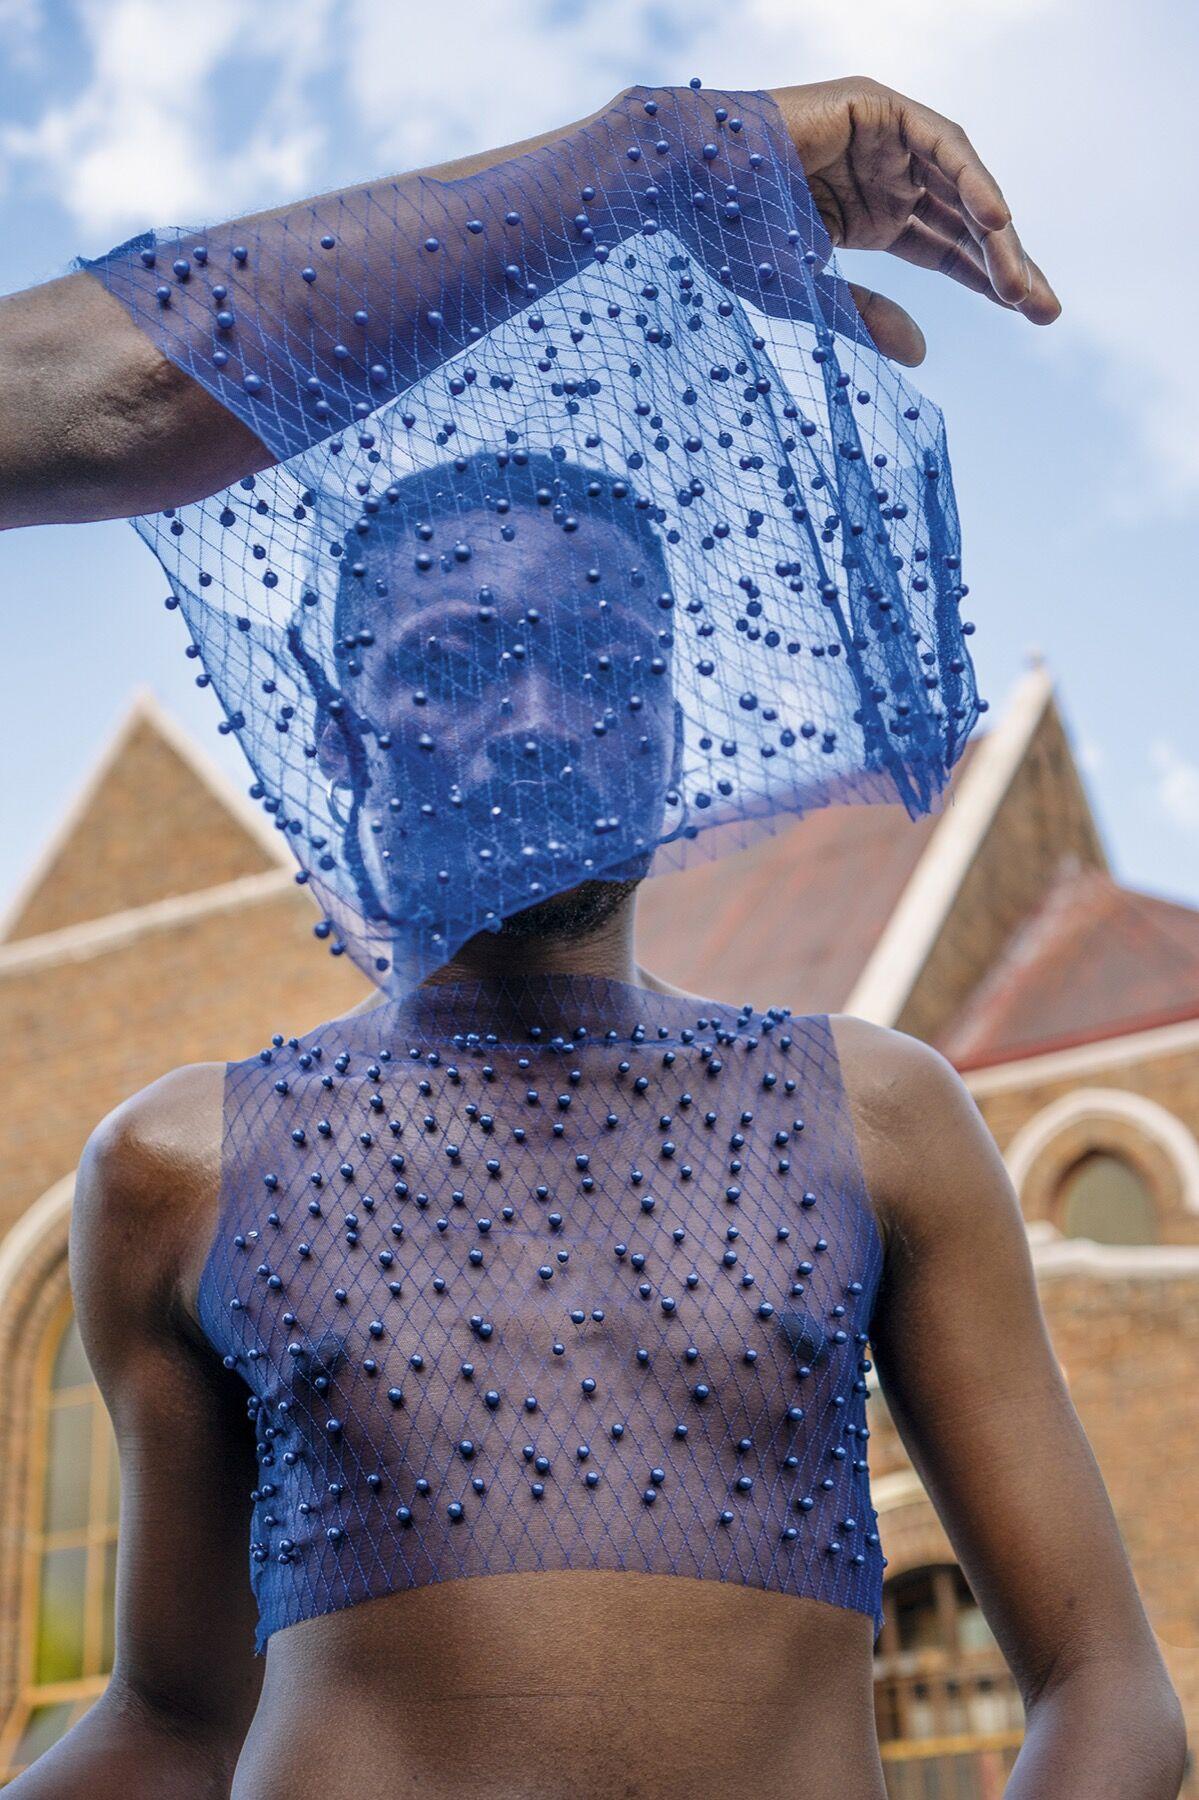 Jamal Nxedlana, FAKA Portraits, Johannesburg, 2019, for Aperture. Courtesy of the artist.